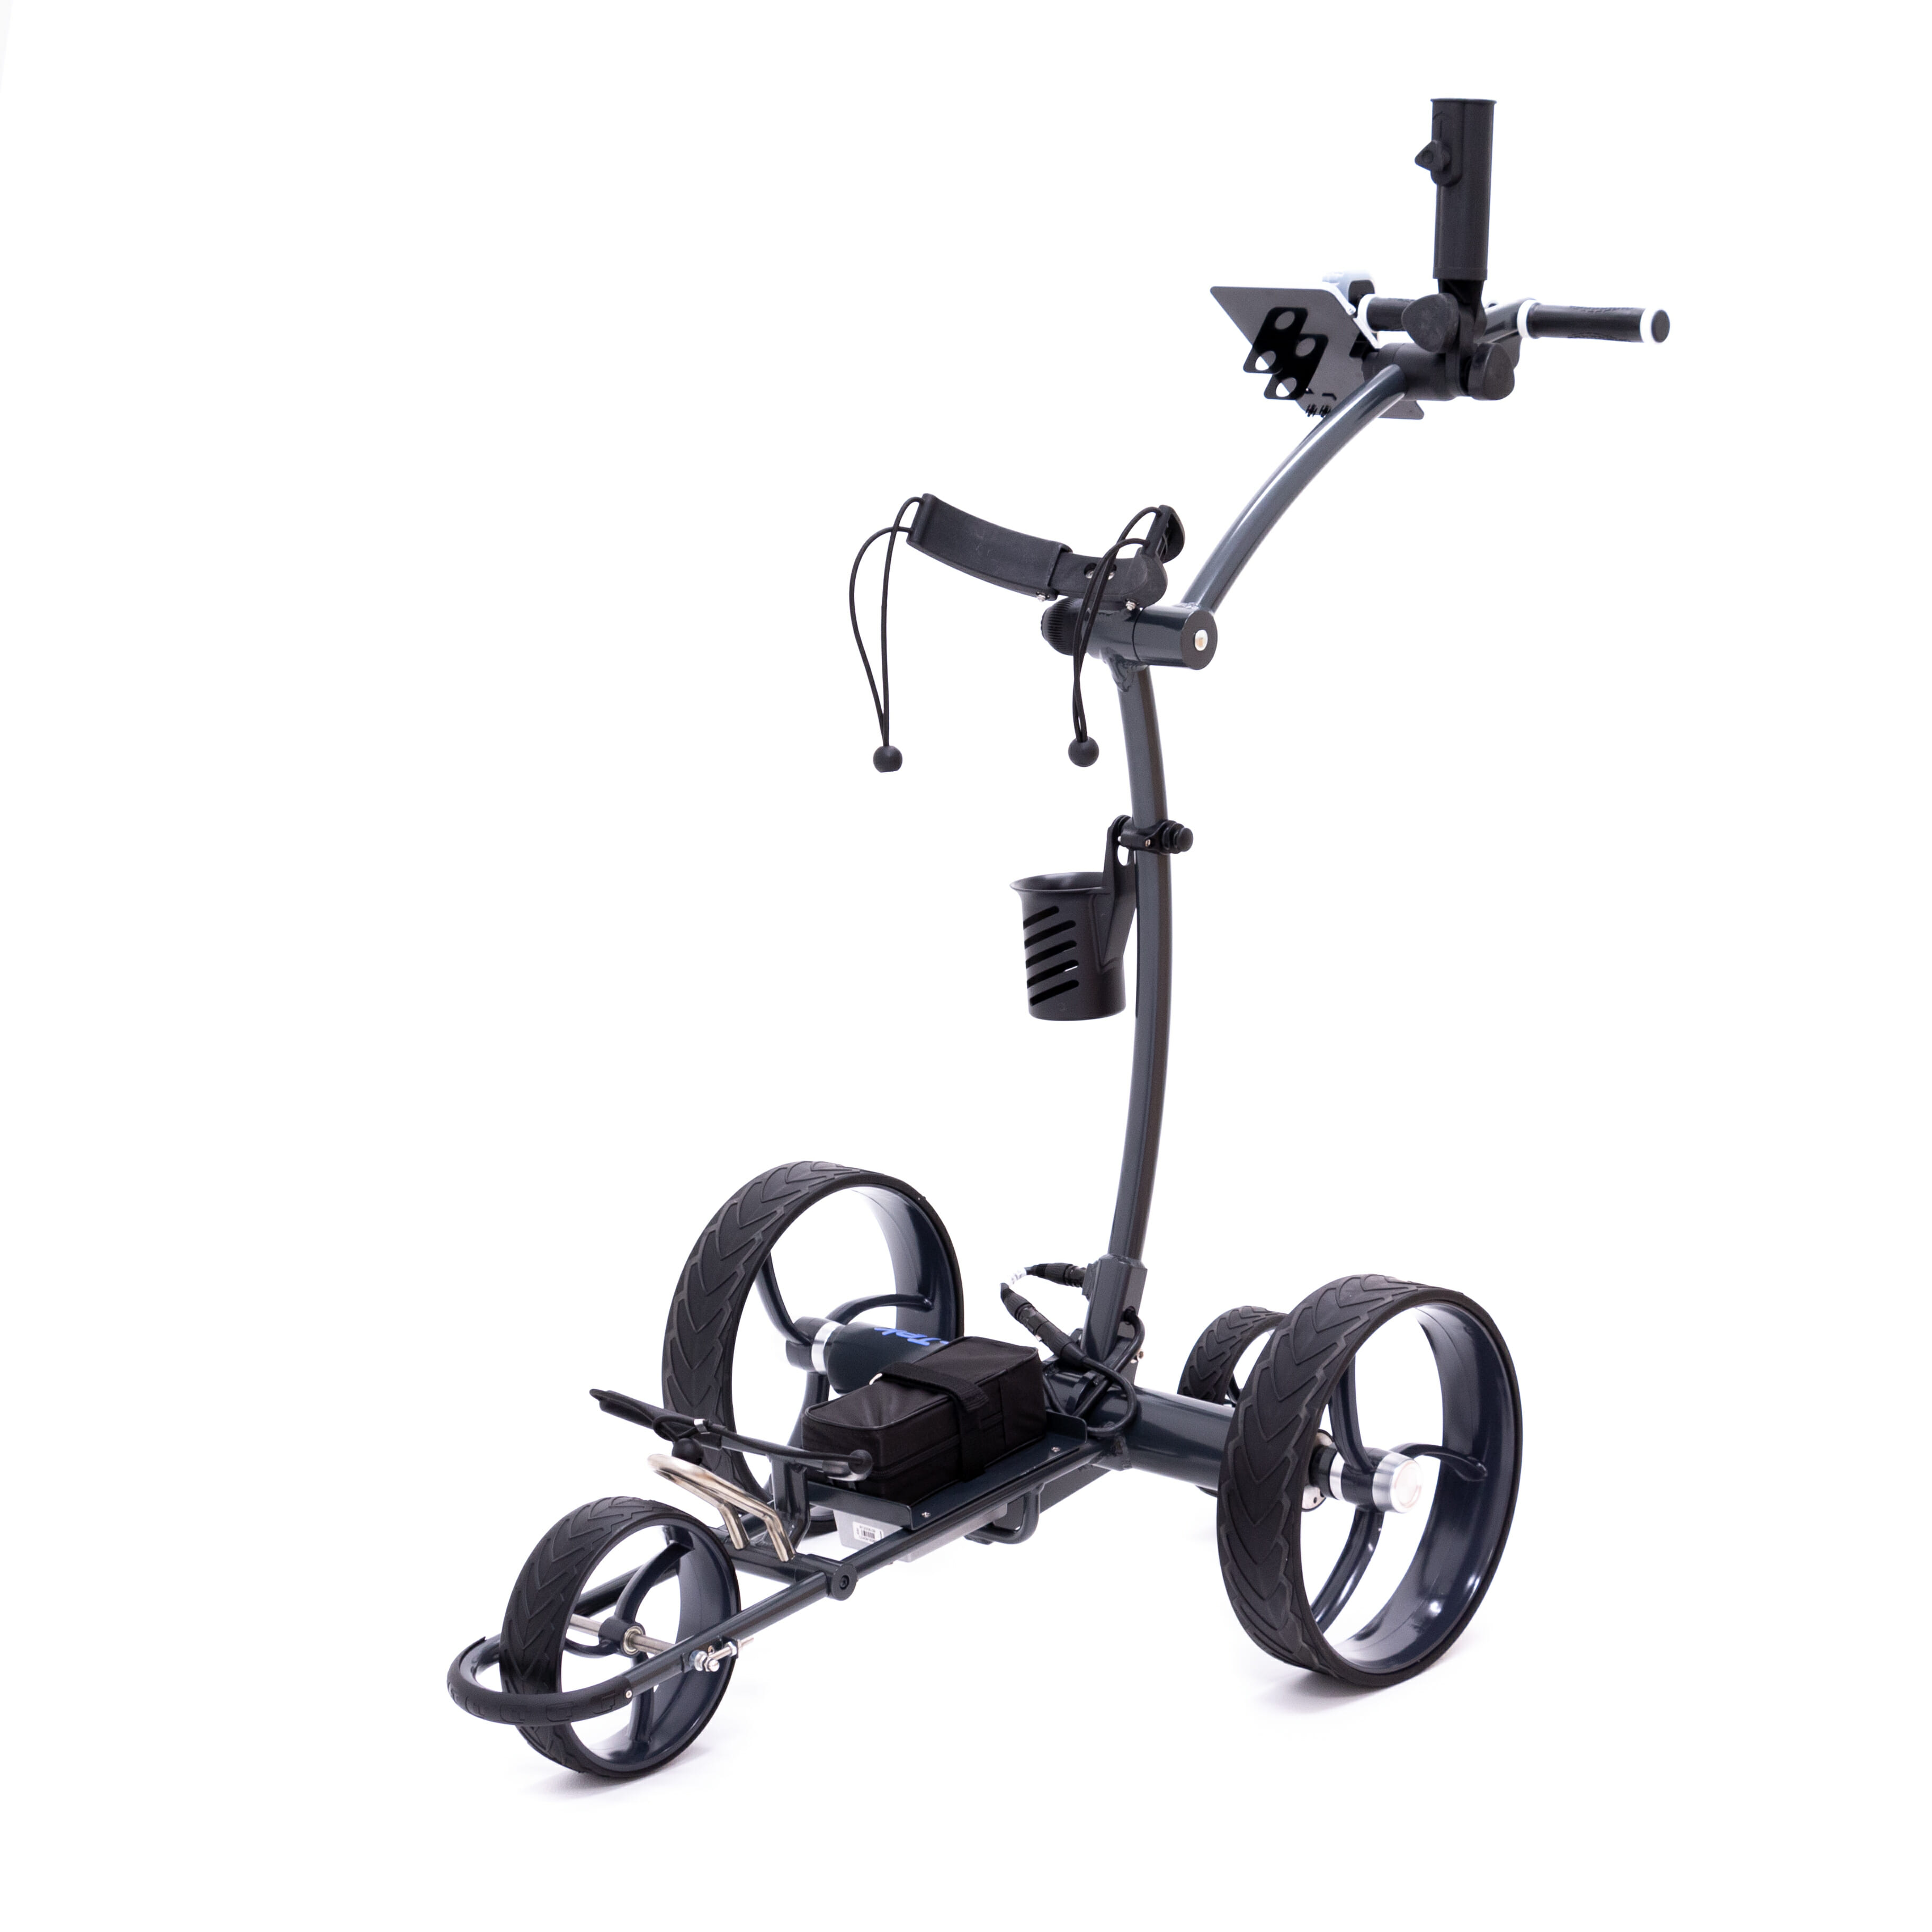 Details about New CartTek 2019 GRi-1500Li Remote Controlled Golf Caddy Gray